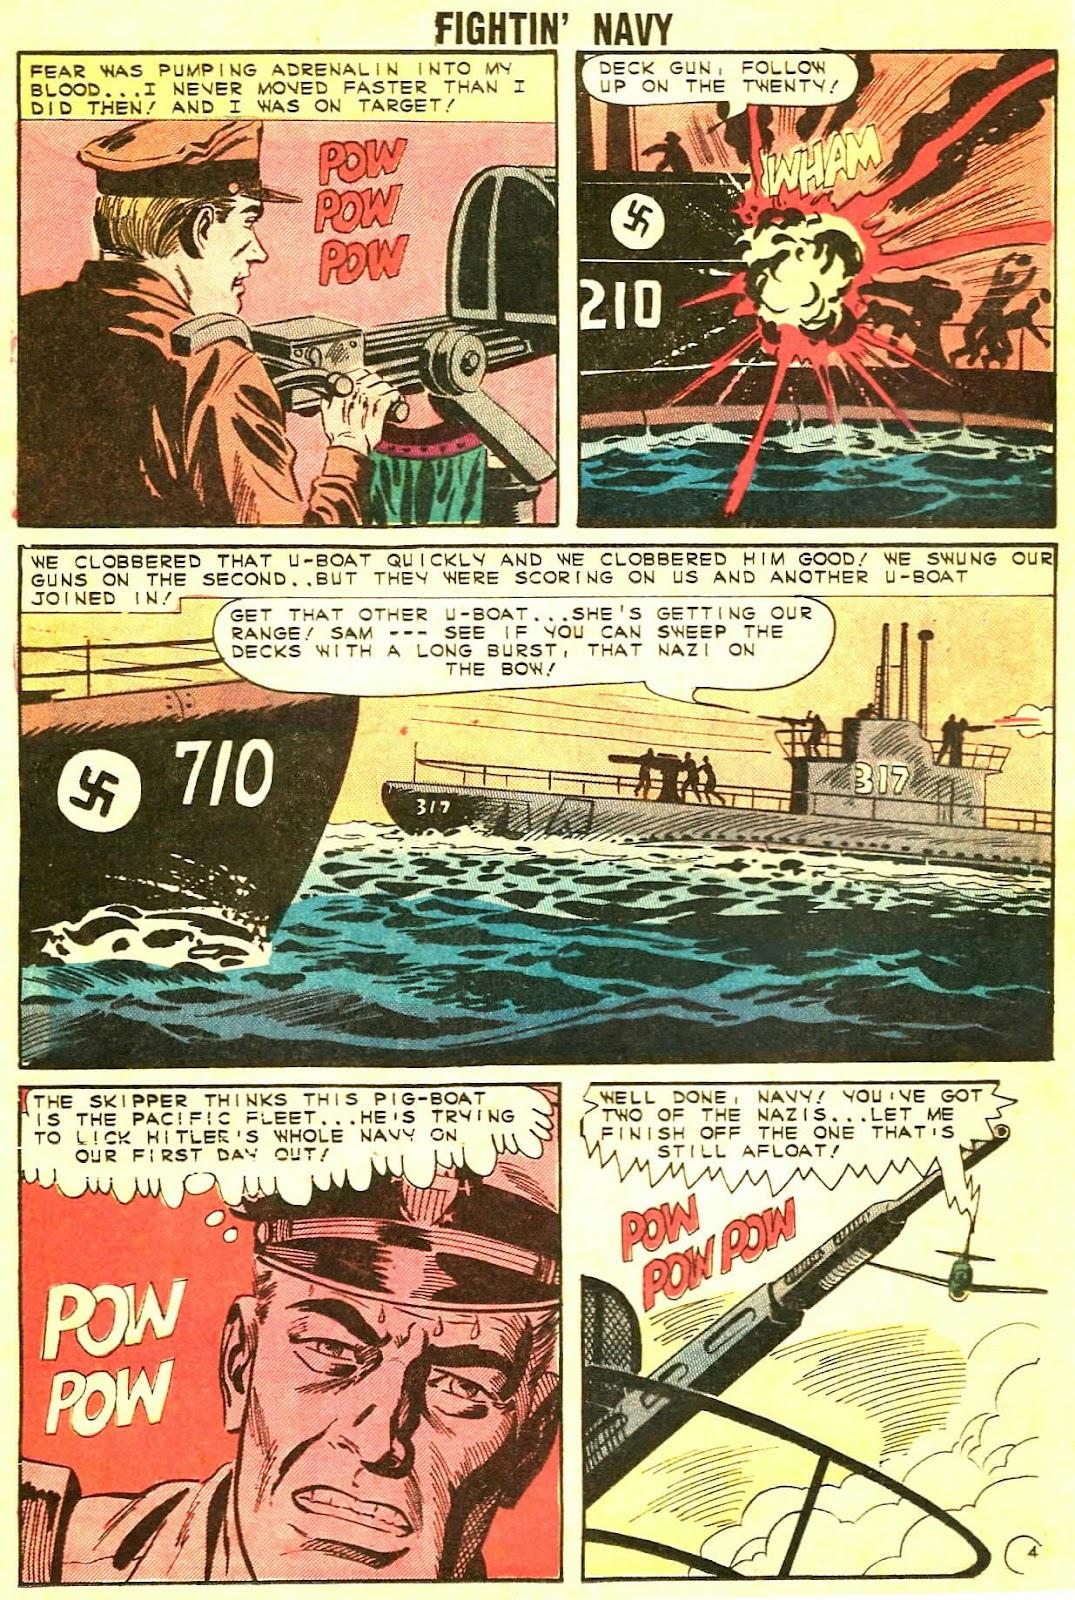 Read online Fightin' Navy comic -  Issue #115 - 12